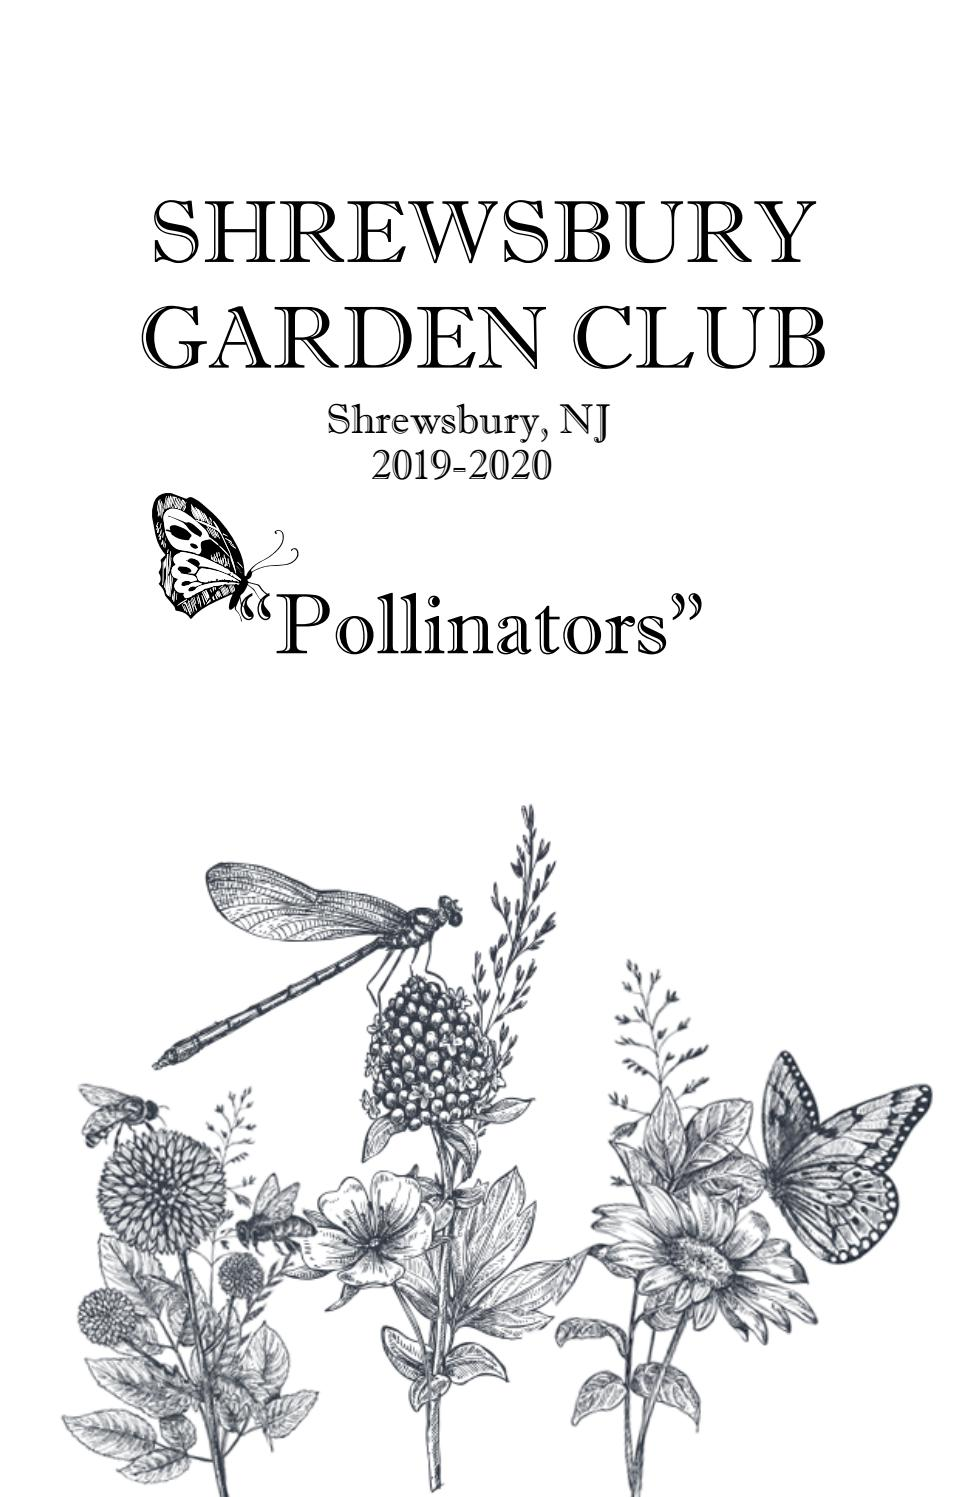 Butterfly Release 2020 Fair Lawn Nj.Shrewsbury Garden Club Yearbook 2019 2020 By Sberdahl Issuu